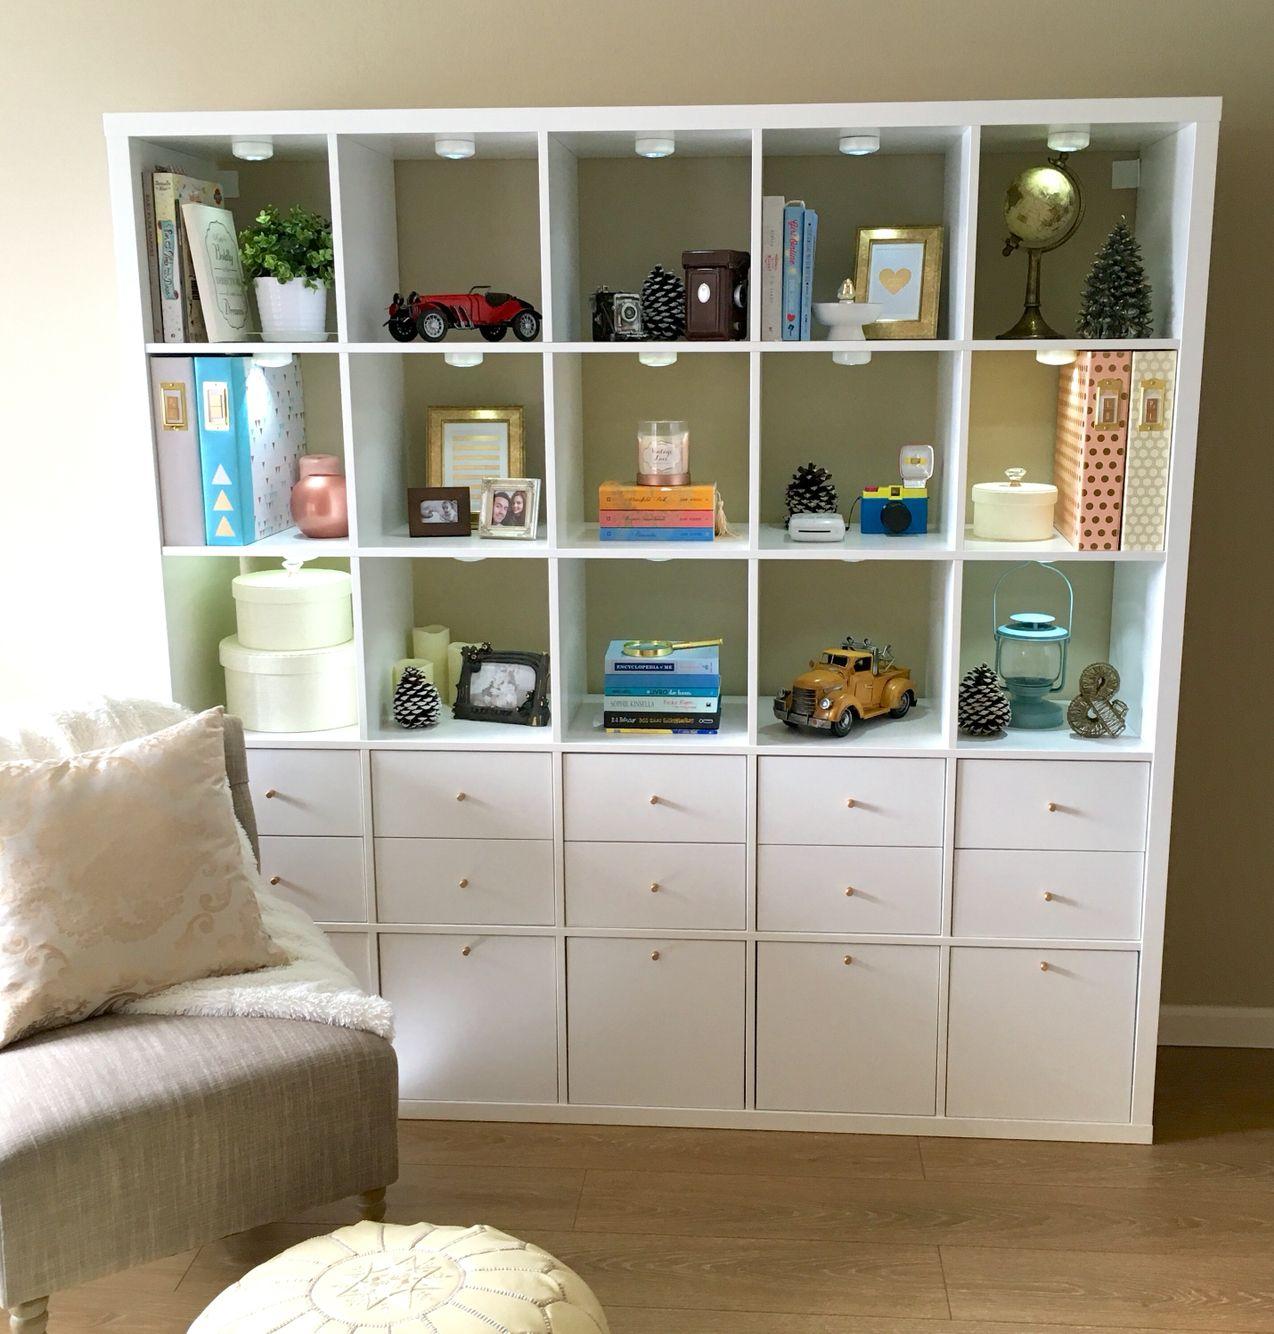 geschirrschrank pinterest vitrine wei landhausm bel wei geschirrschrank wei. Black Bedroom Furniture Sets. Home Design Ideas